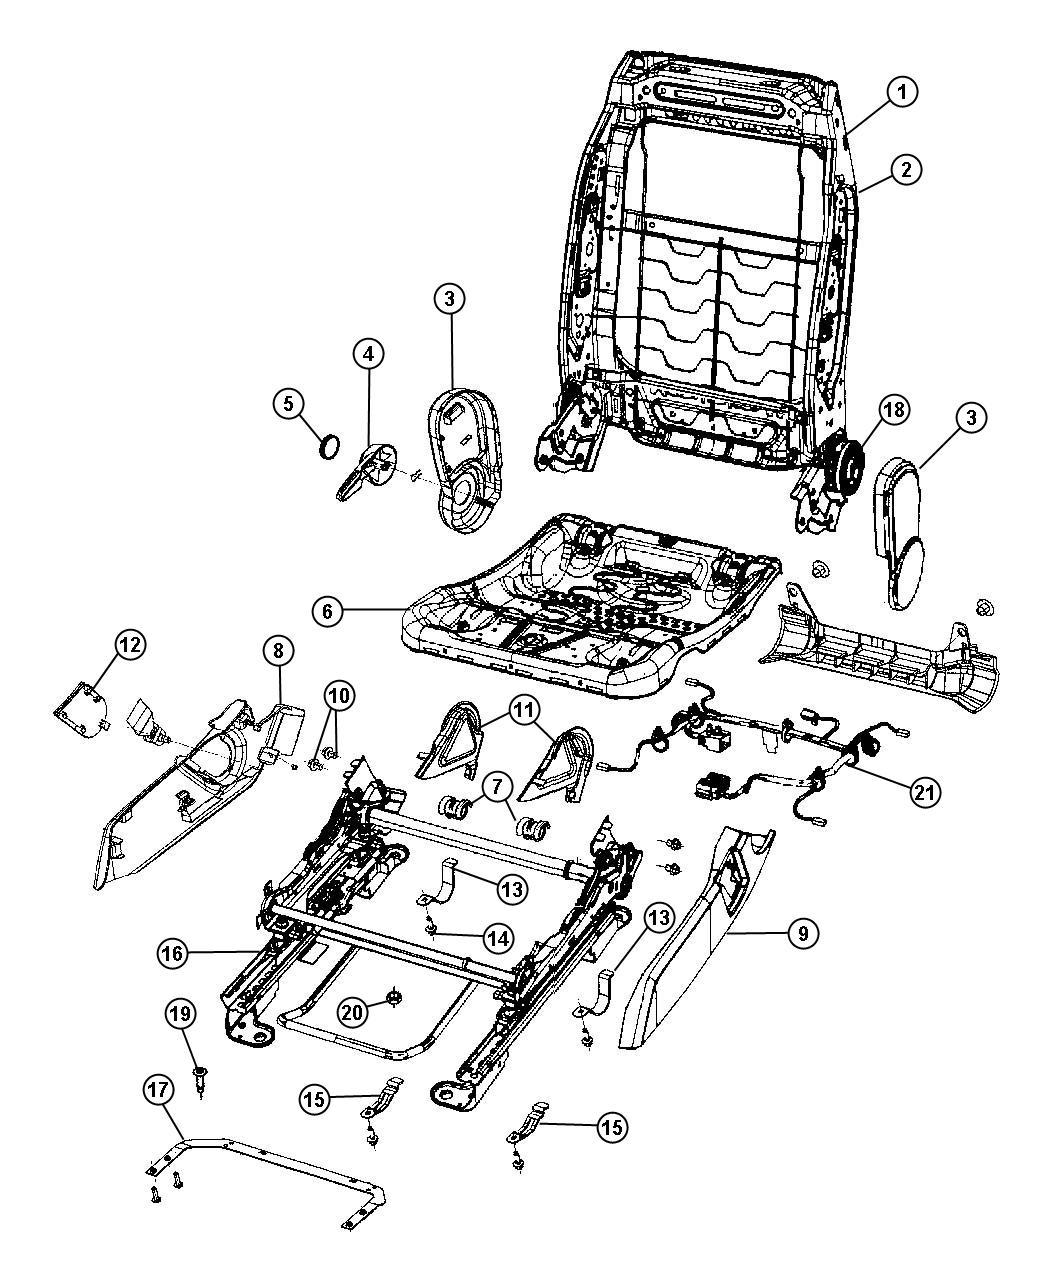 2007 jeep patriot Motordiagramm